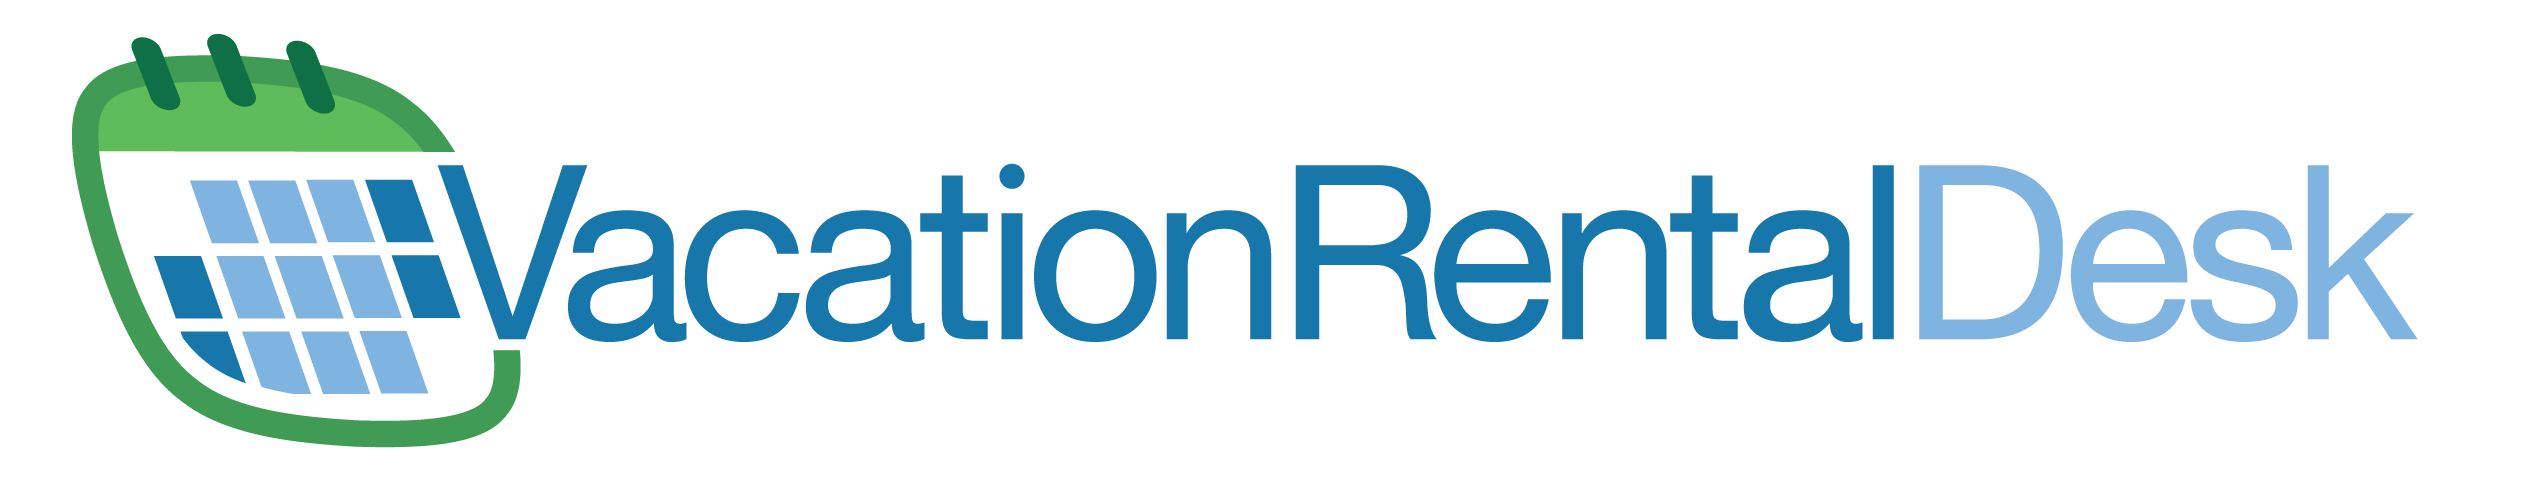 Vacation Rental Desk Logo